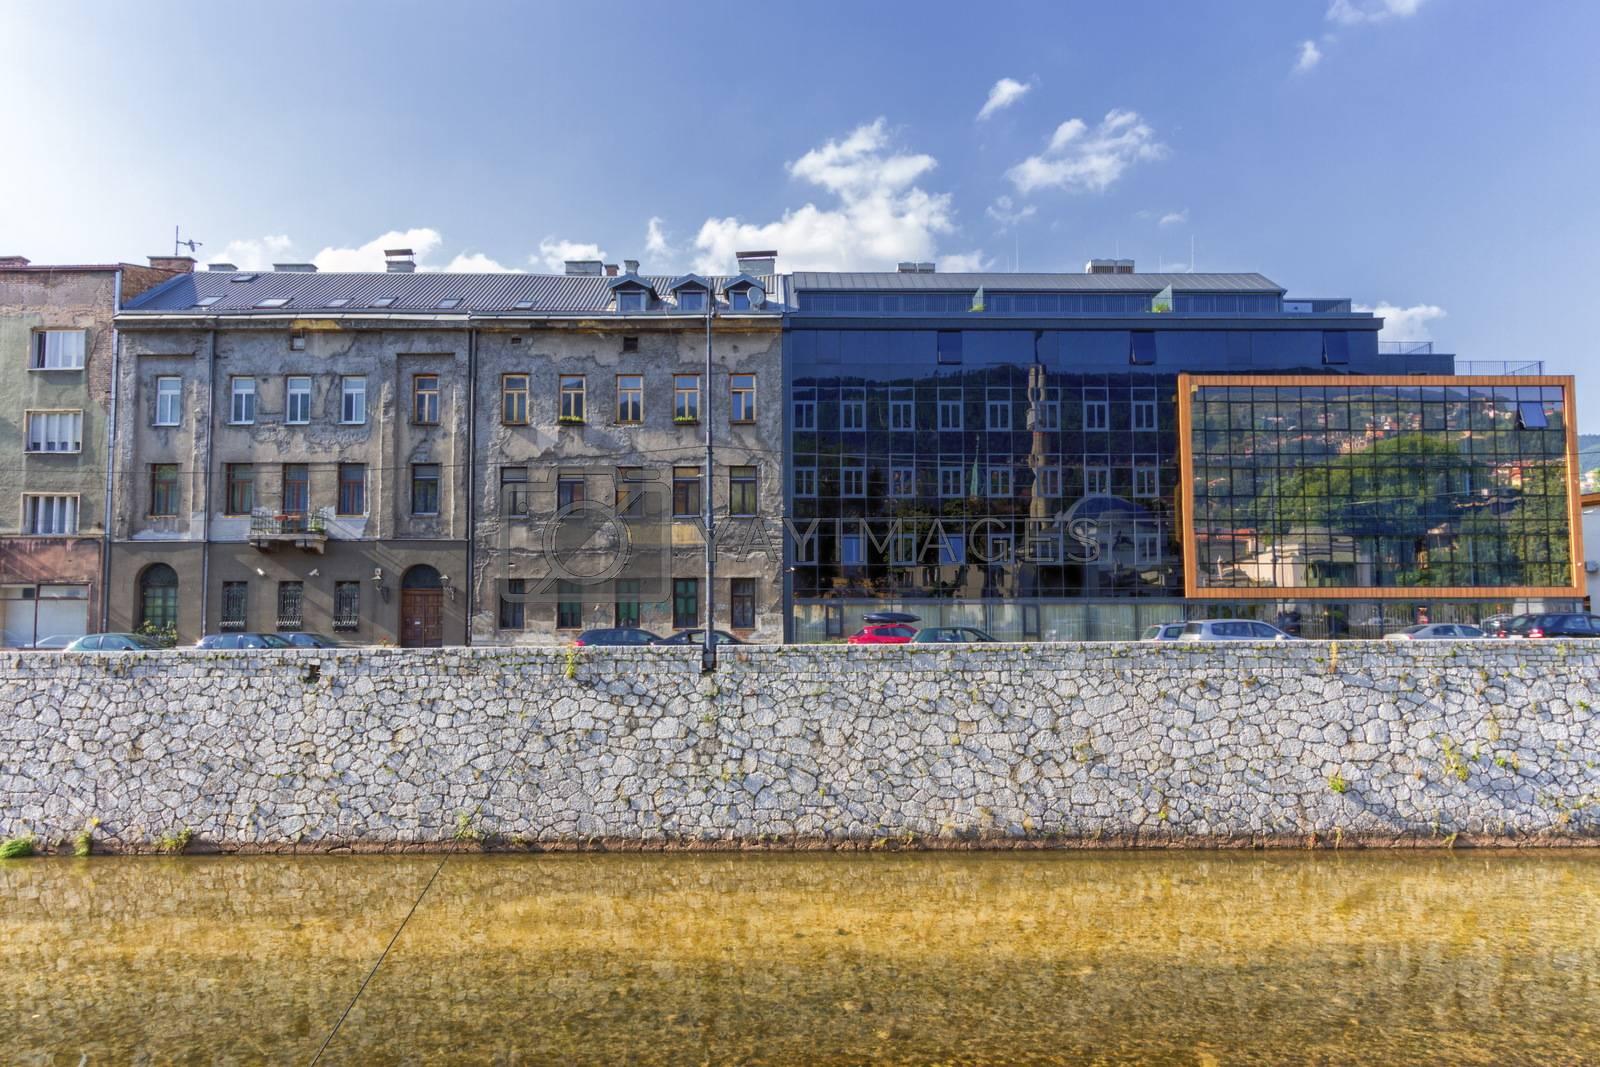 Old and modern buildings in Sarajevo by day and Milyacka River, Bosnia-Herzergovina